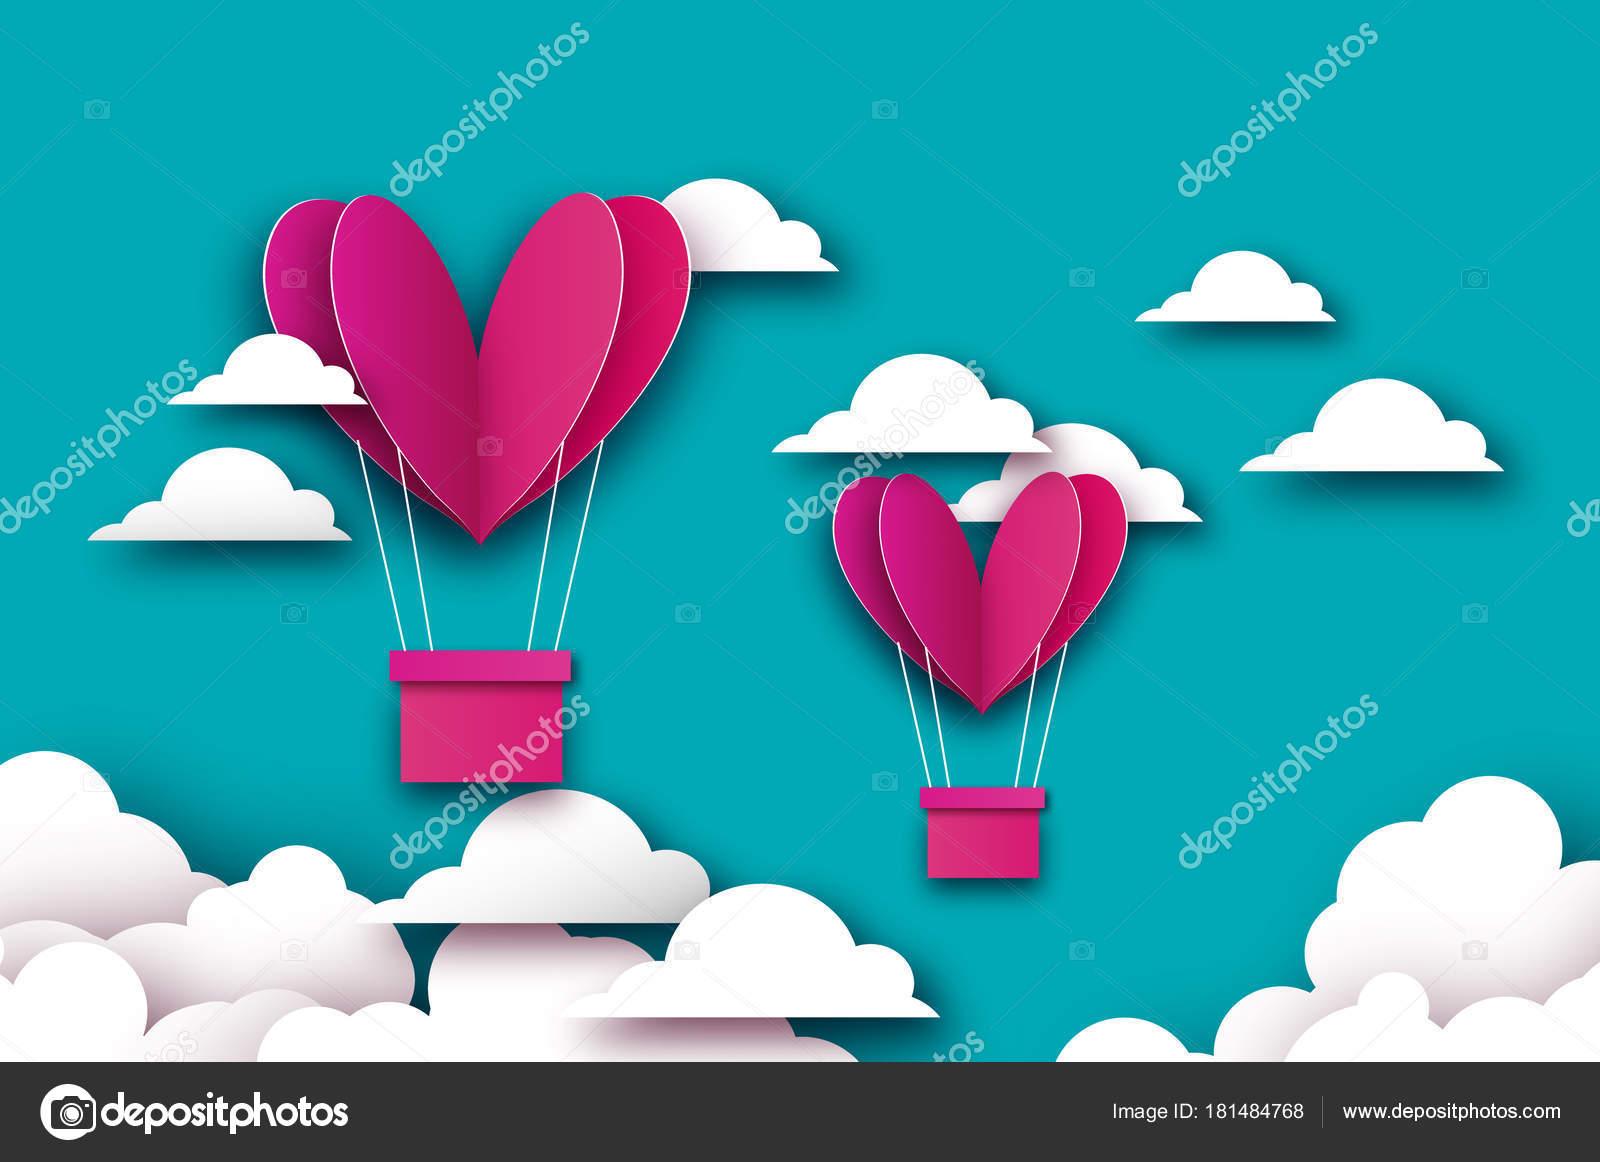 Heart shape pink hot air balloon flying love in paper cut style heart shape pink hot air balloon flying love in paper cut style origami valentine jeuxipadfo Choice Image